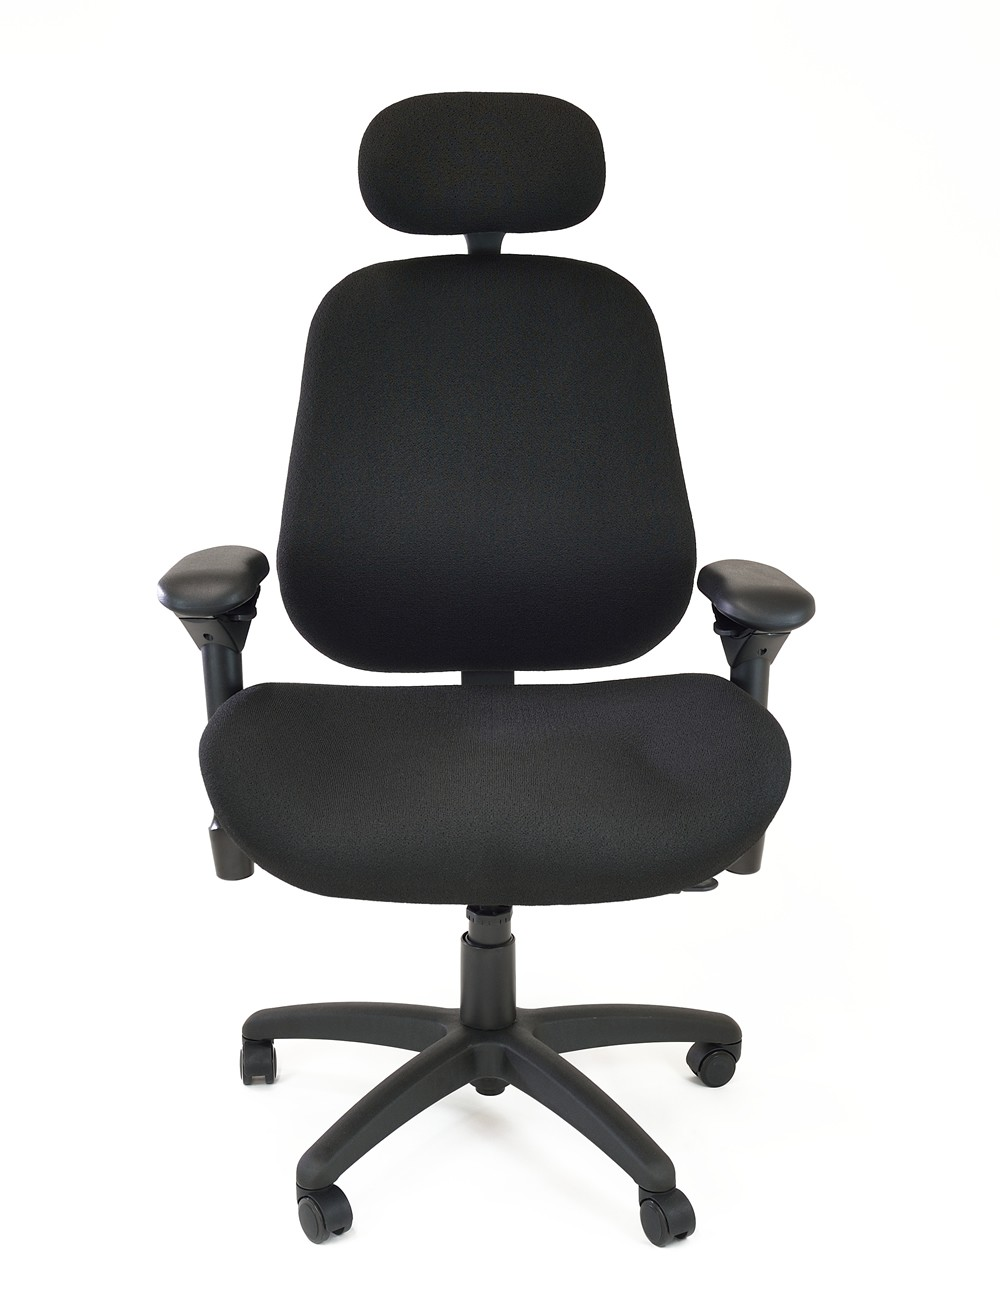 BodyBilt Big and Tall Office Chair J3504   Heavy Duty ...